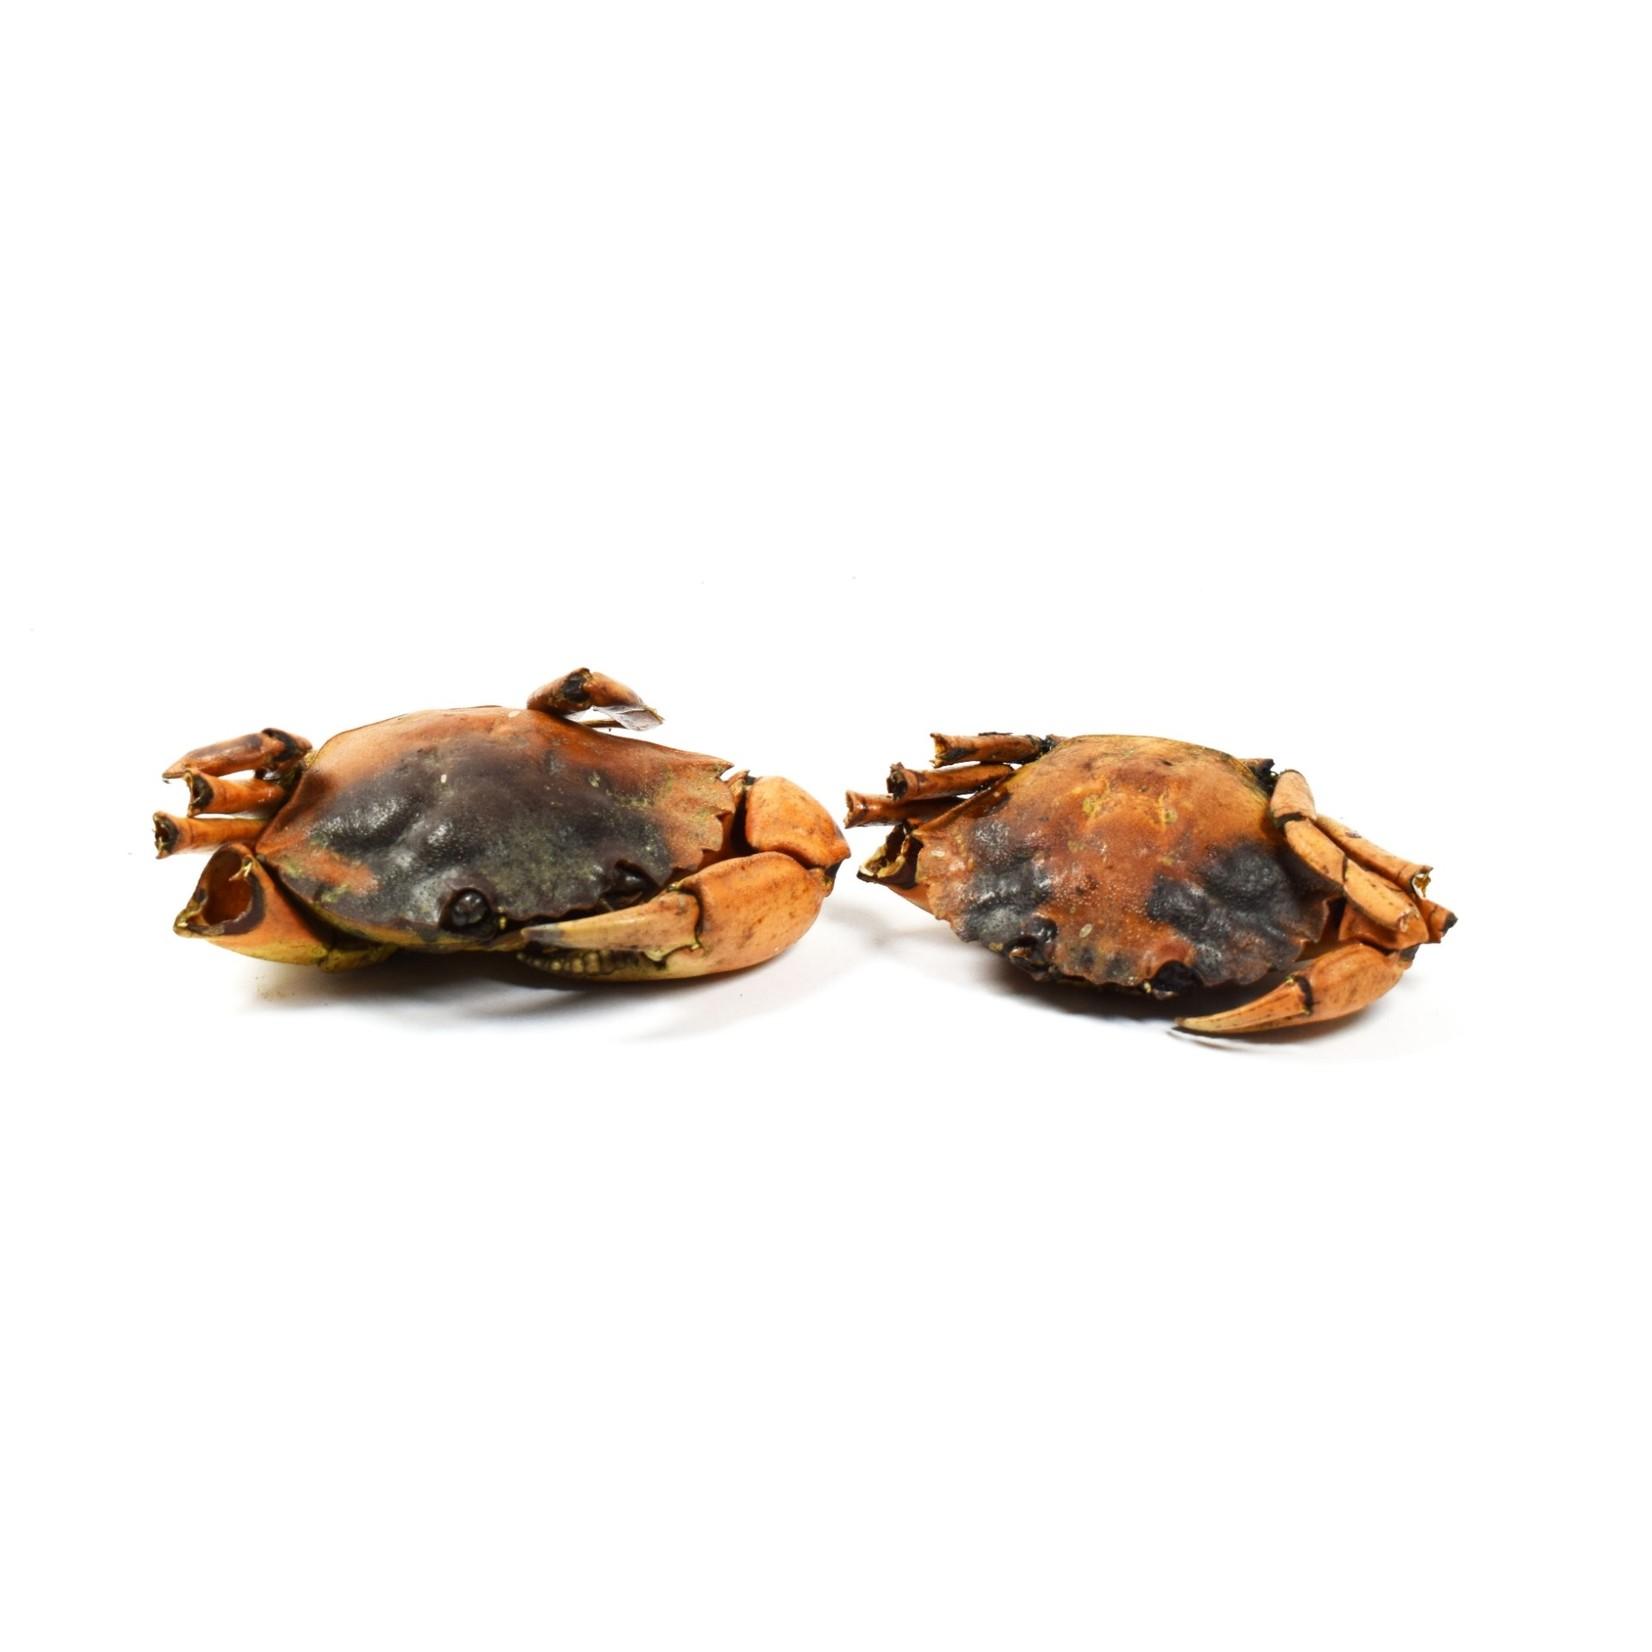 Krabbetjes